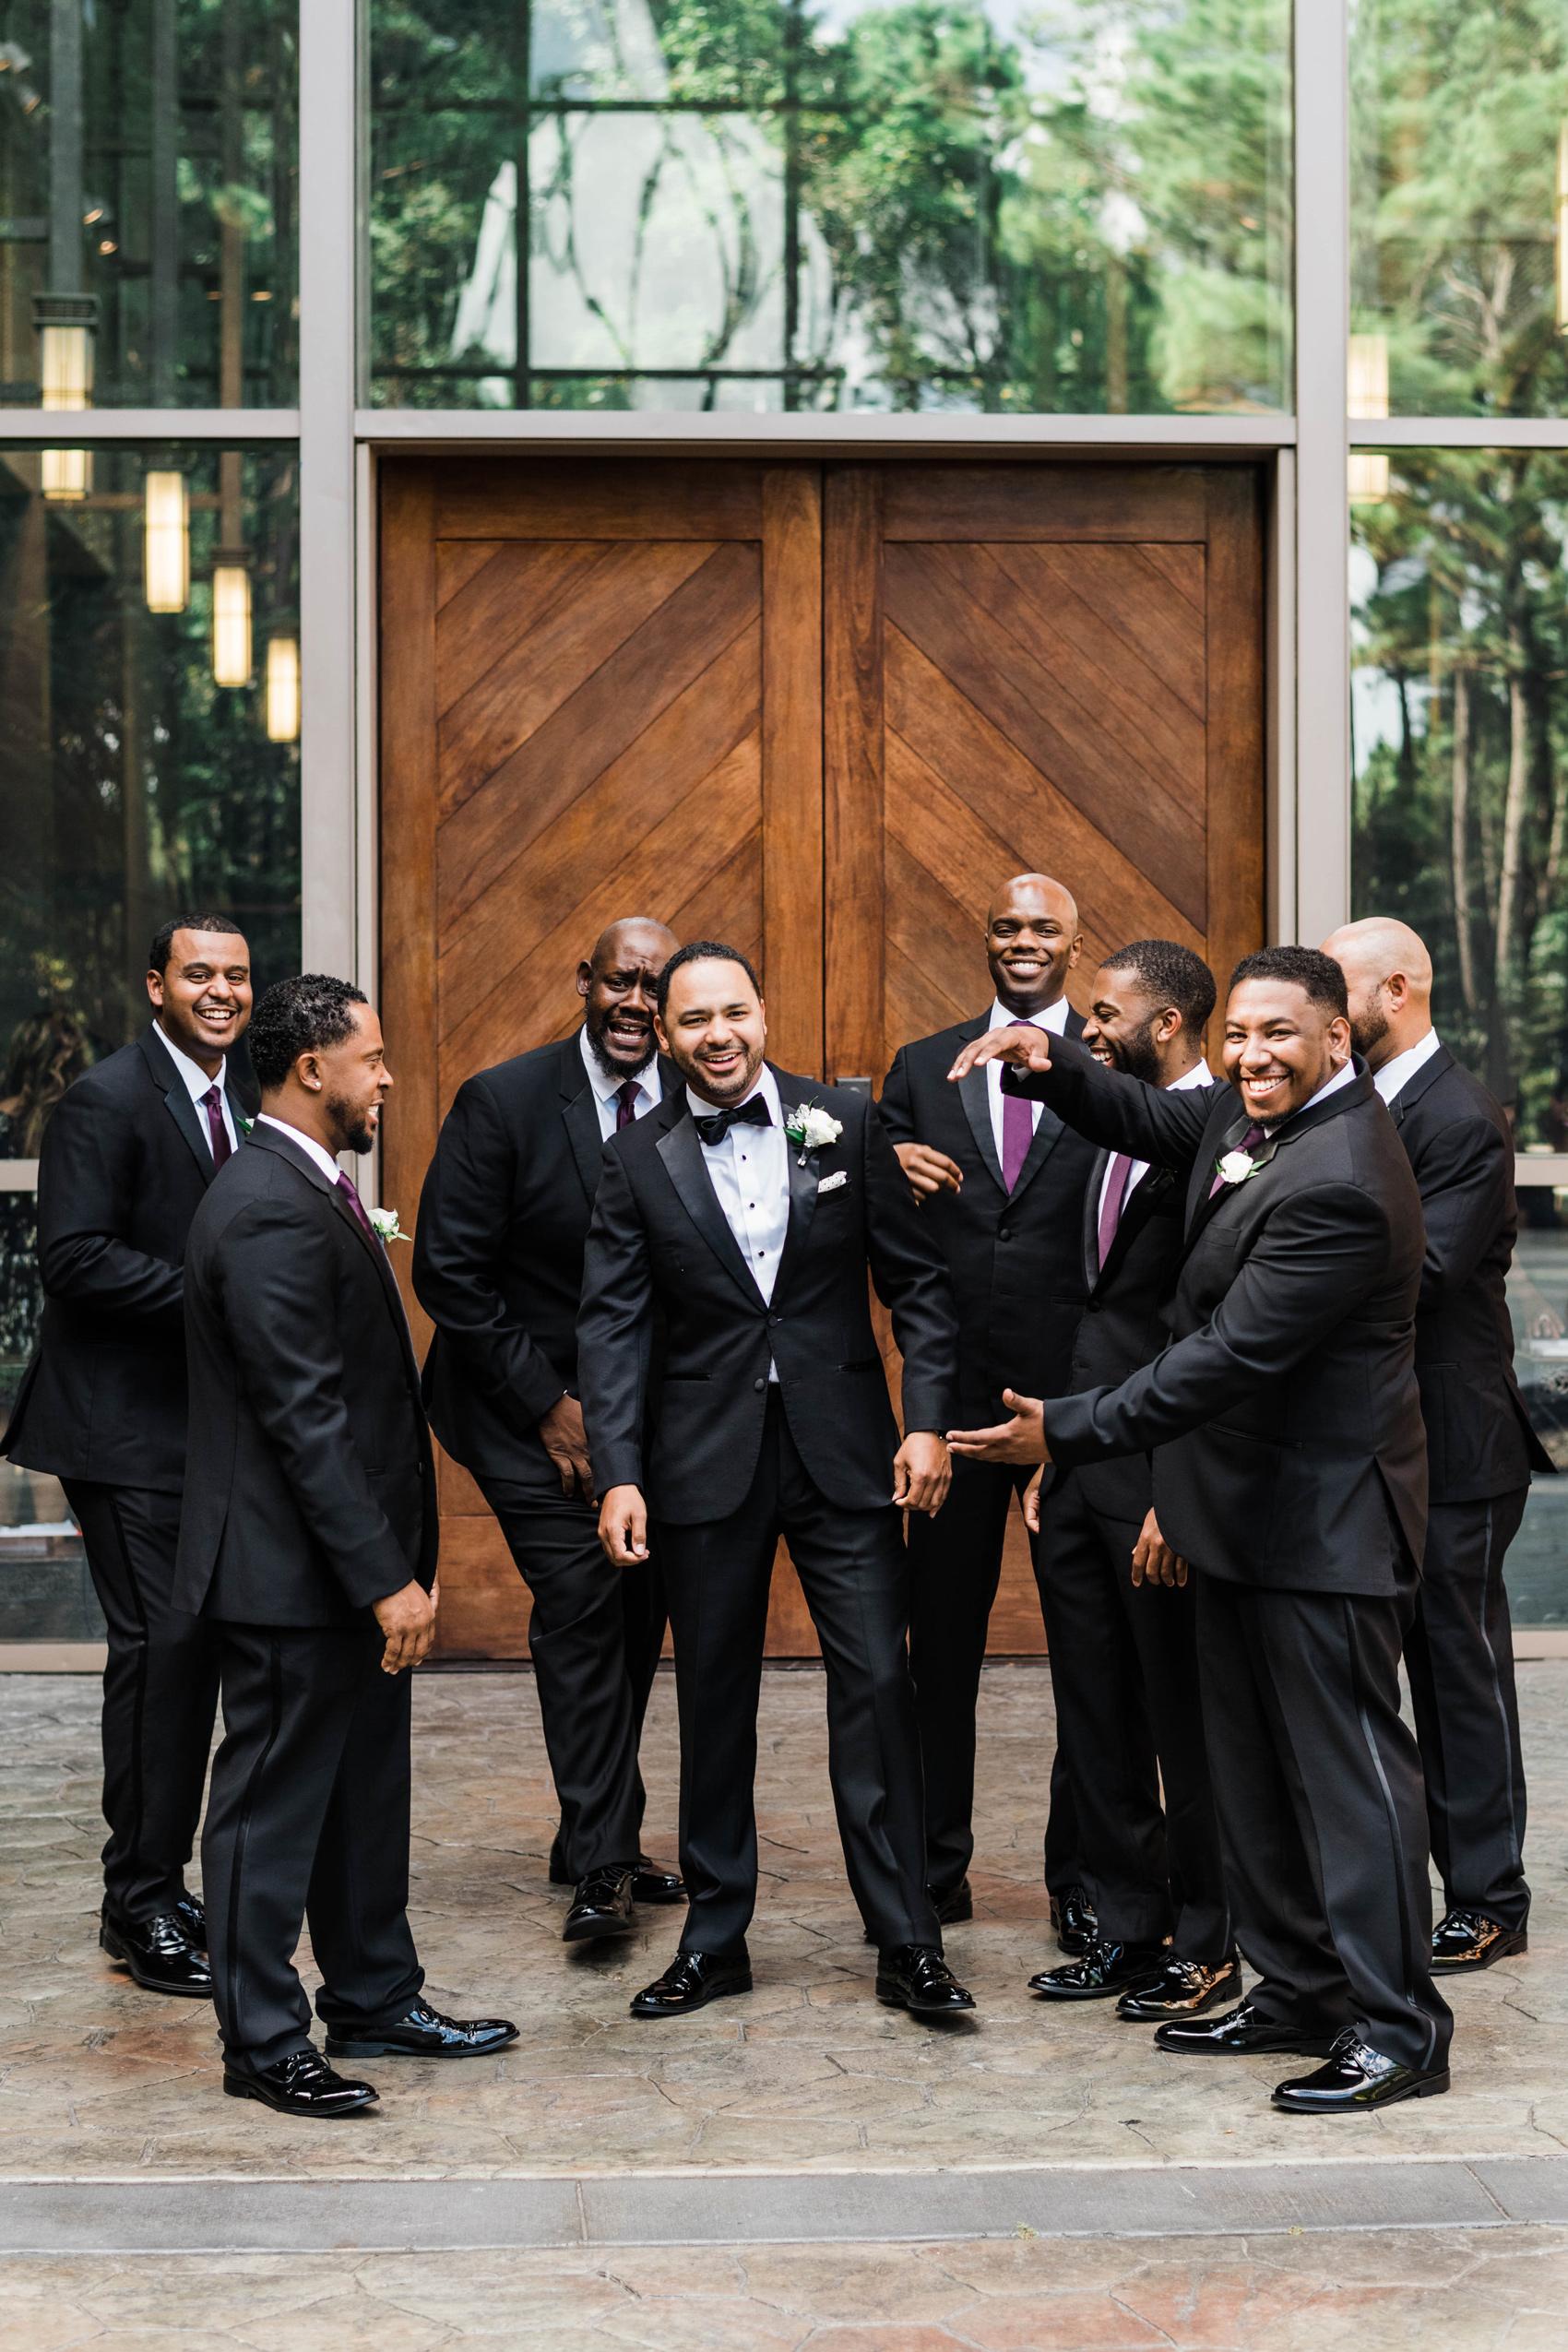 groom standing with groomsmen wearing black tuxedos